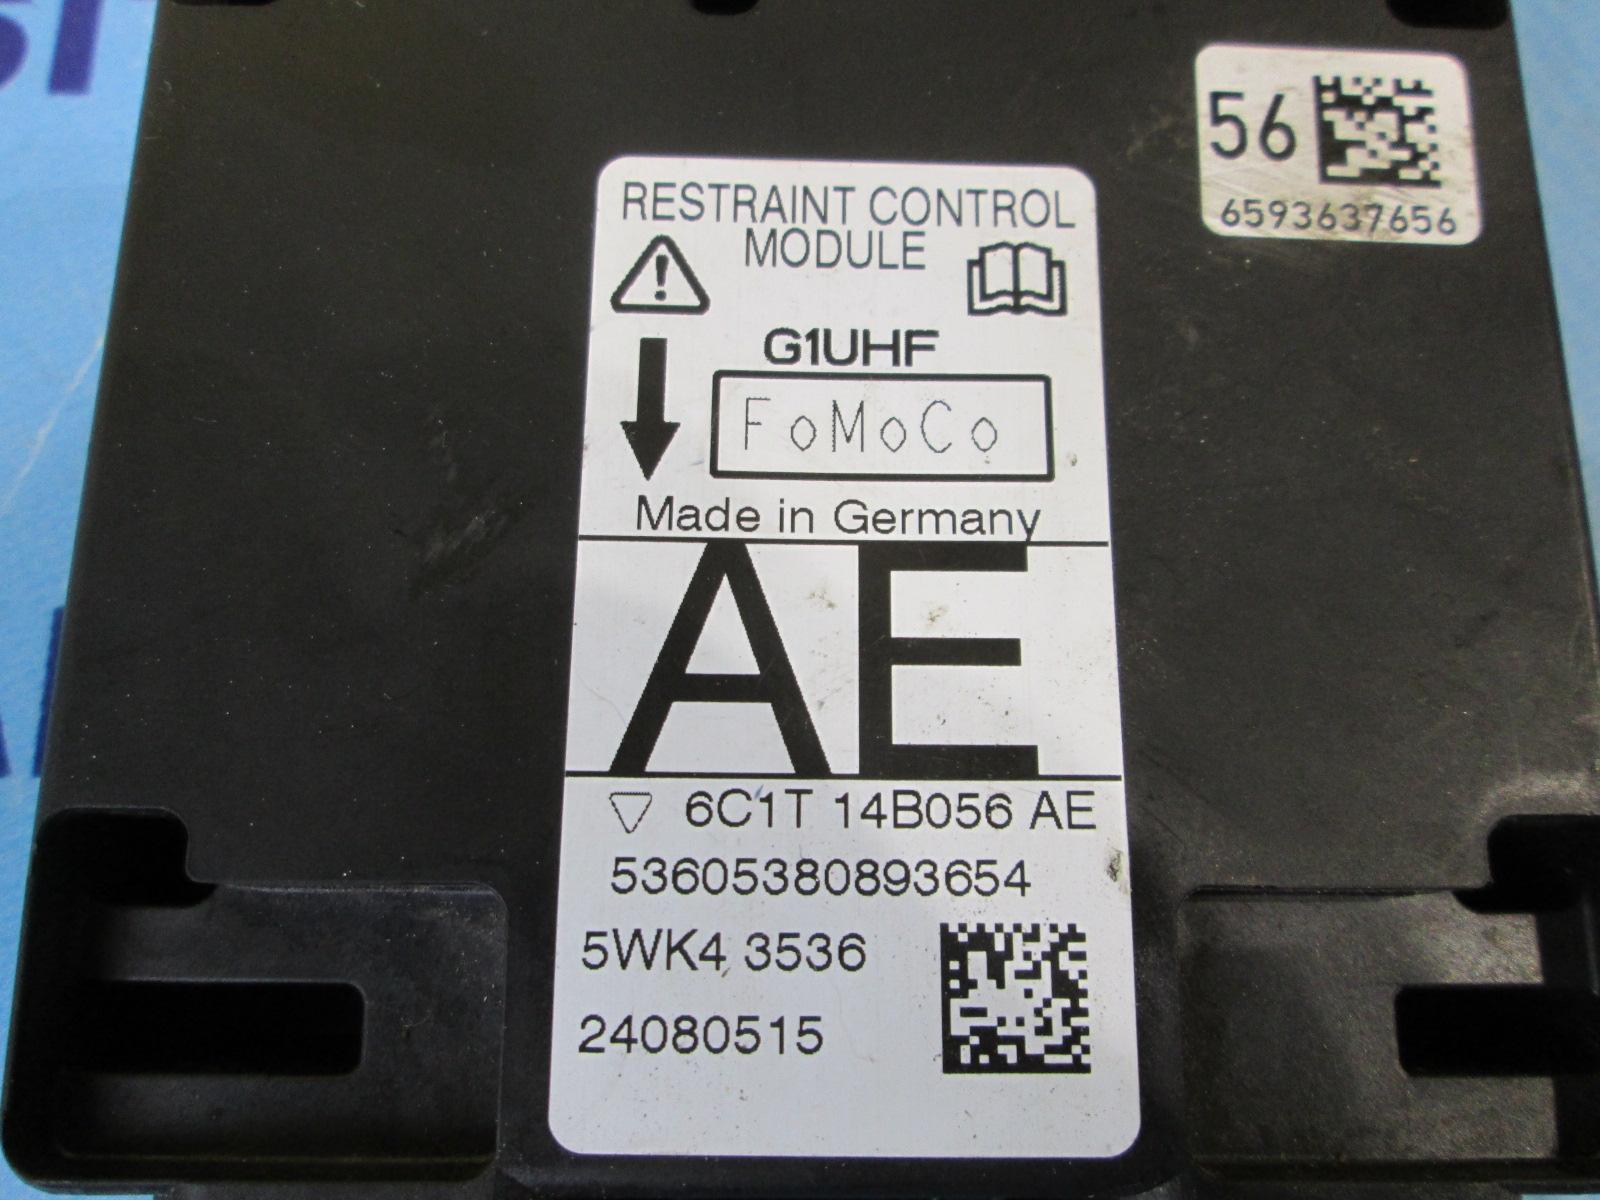 FORD TRANSIT MK7 AIRBAG MODULE 2006-2013 6C1T 14B056 AE